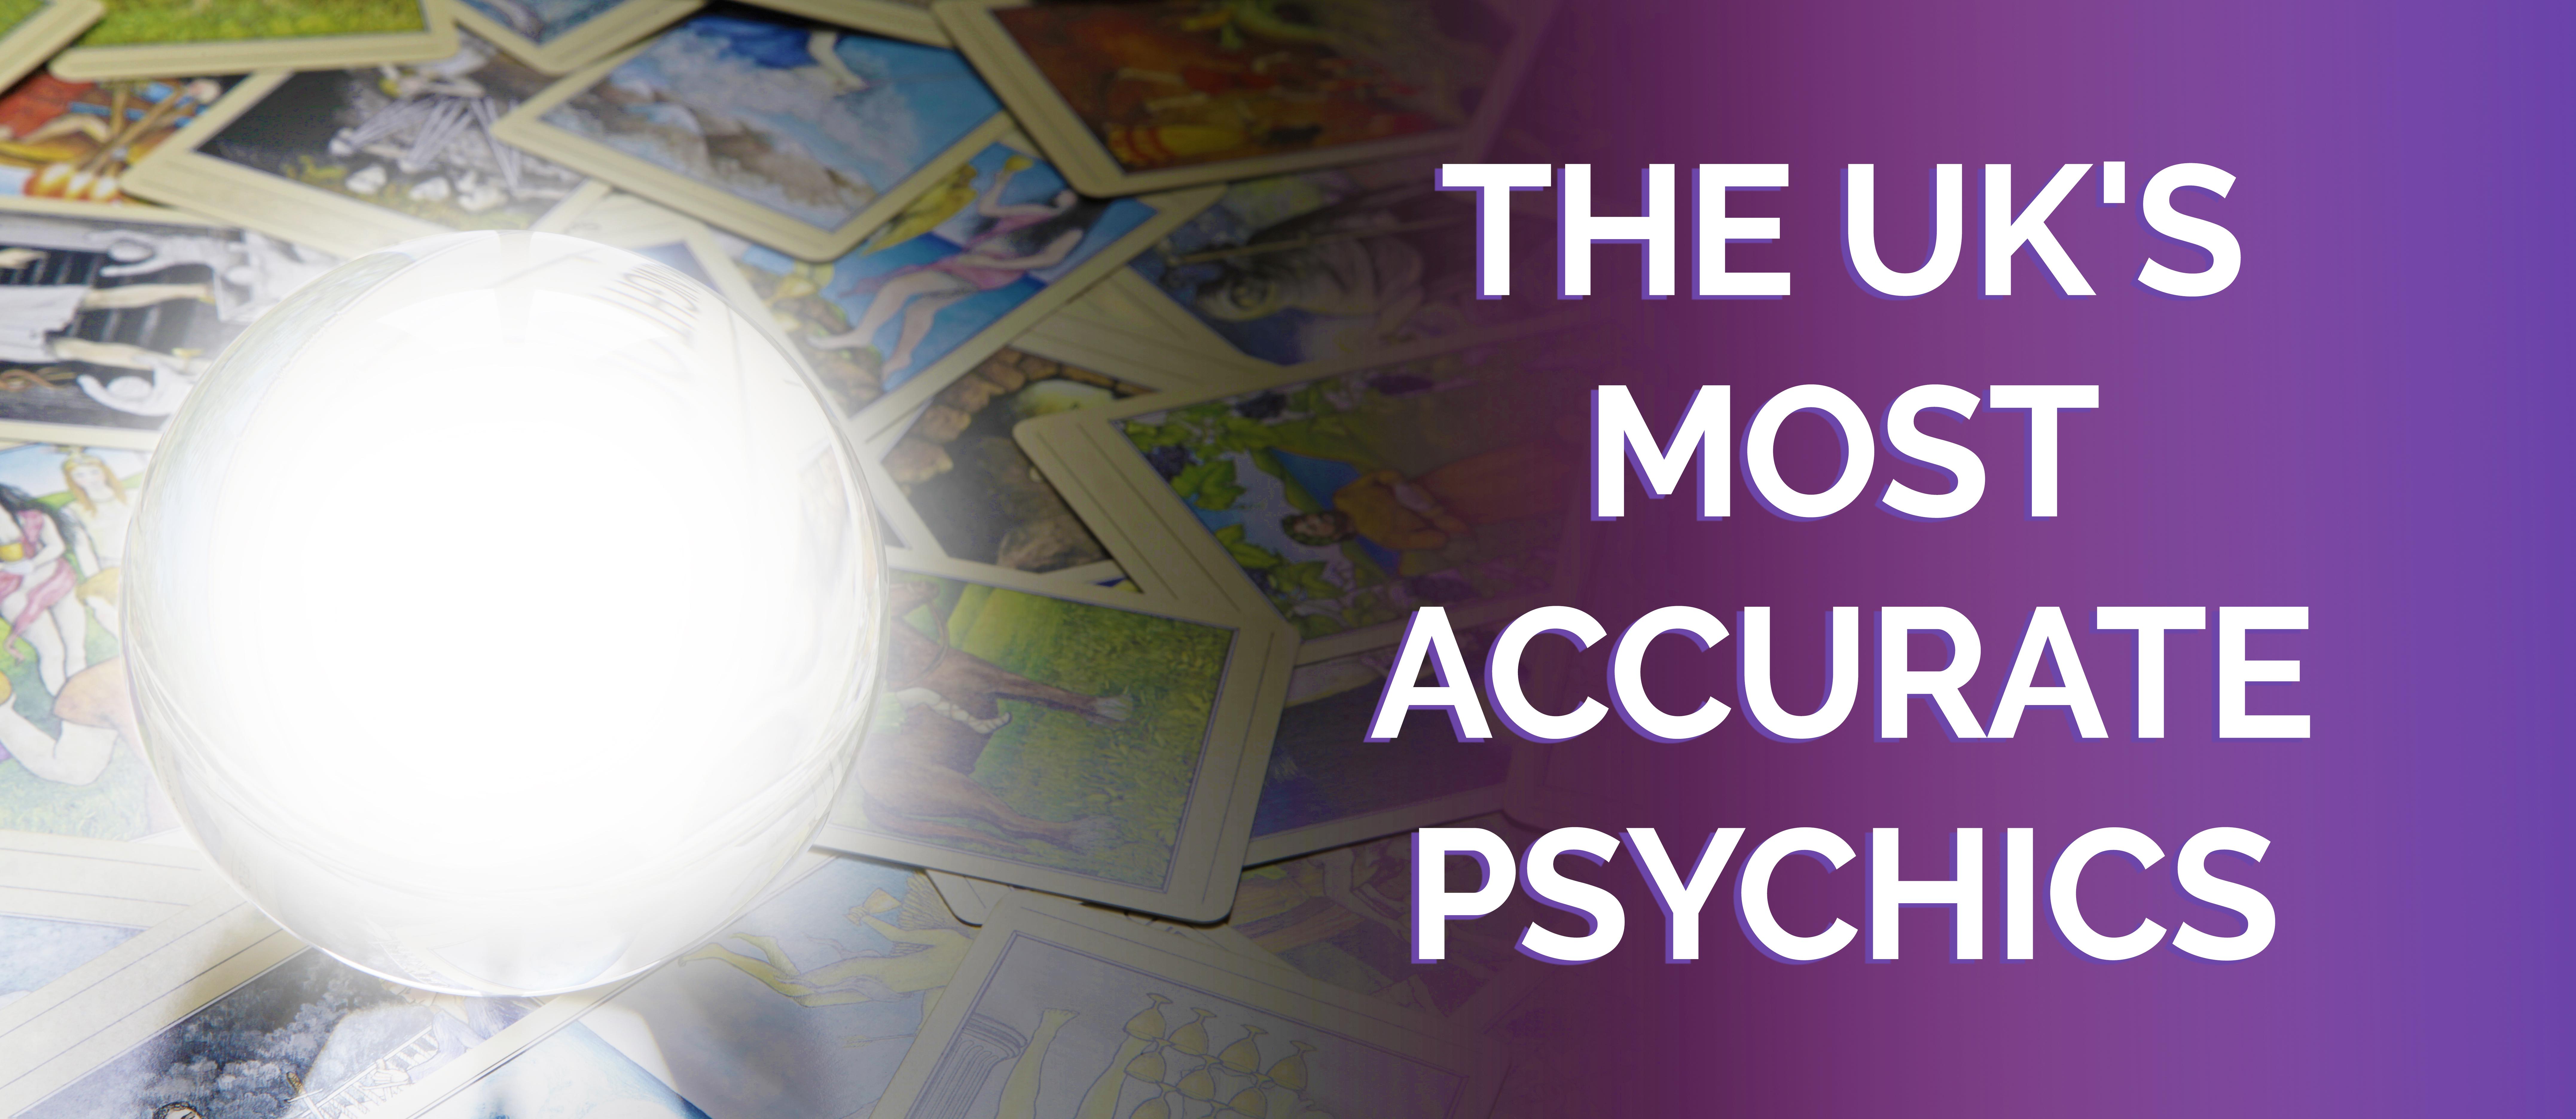 online psychic reading uk